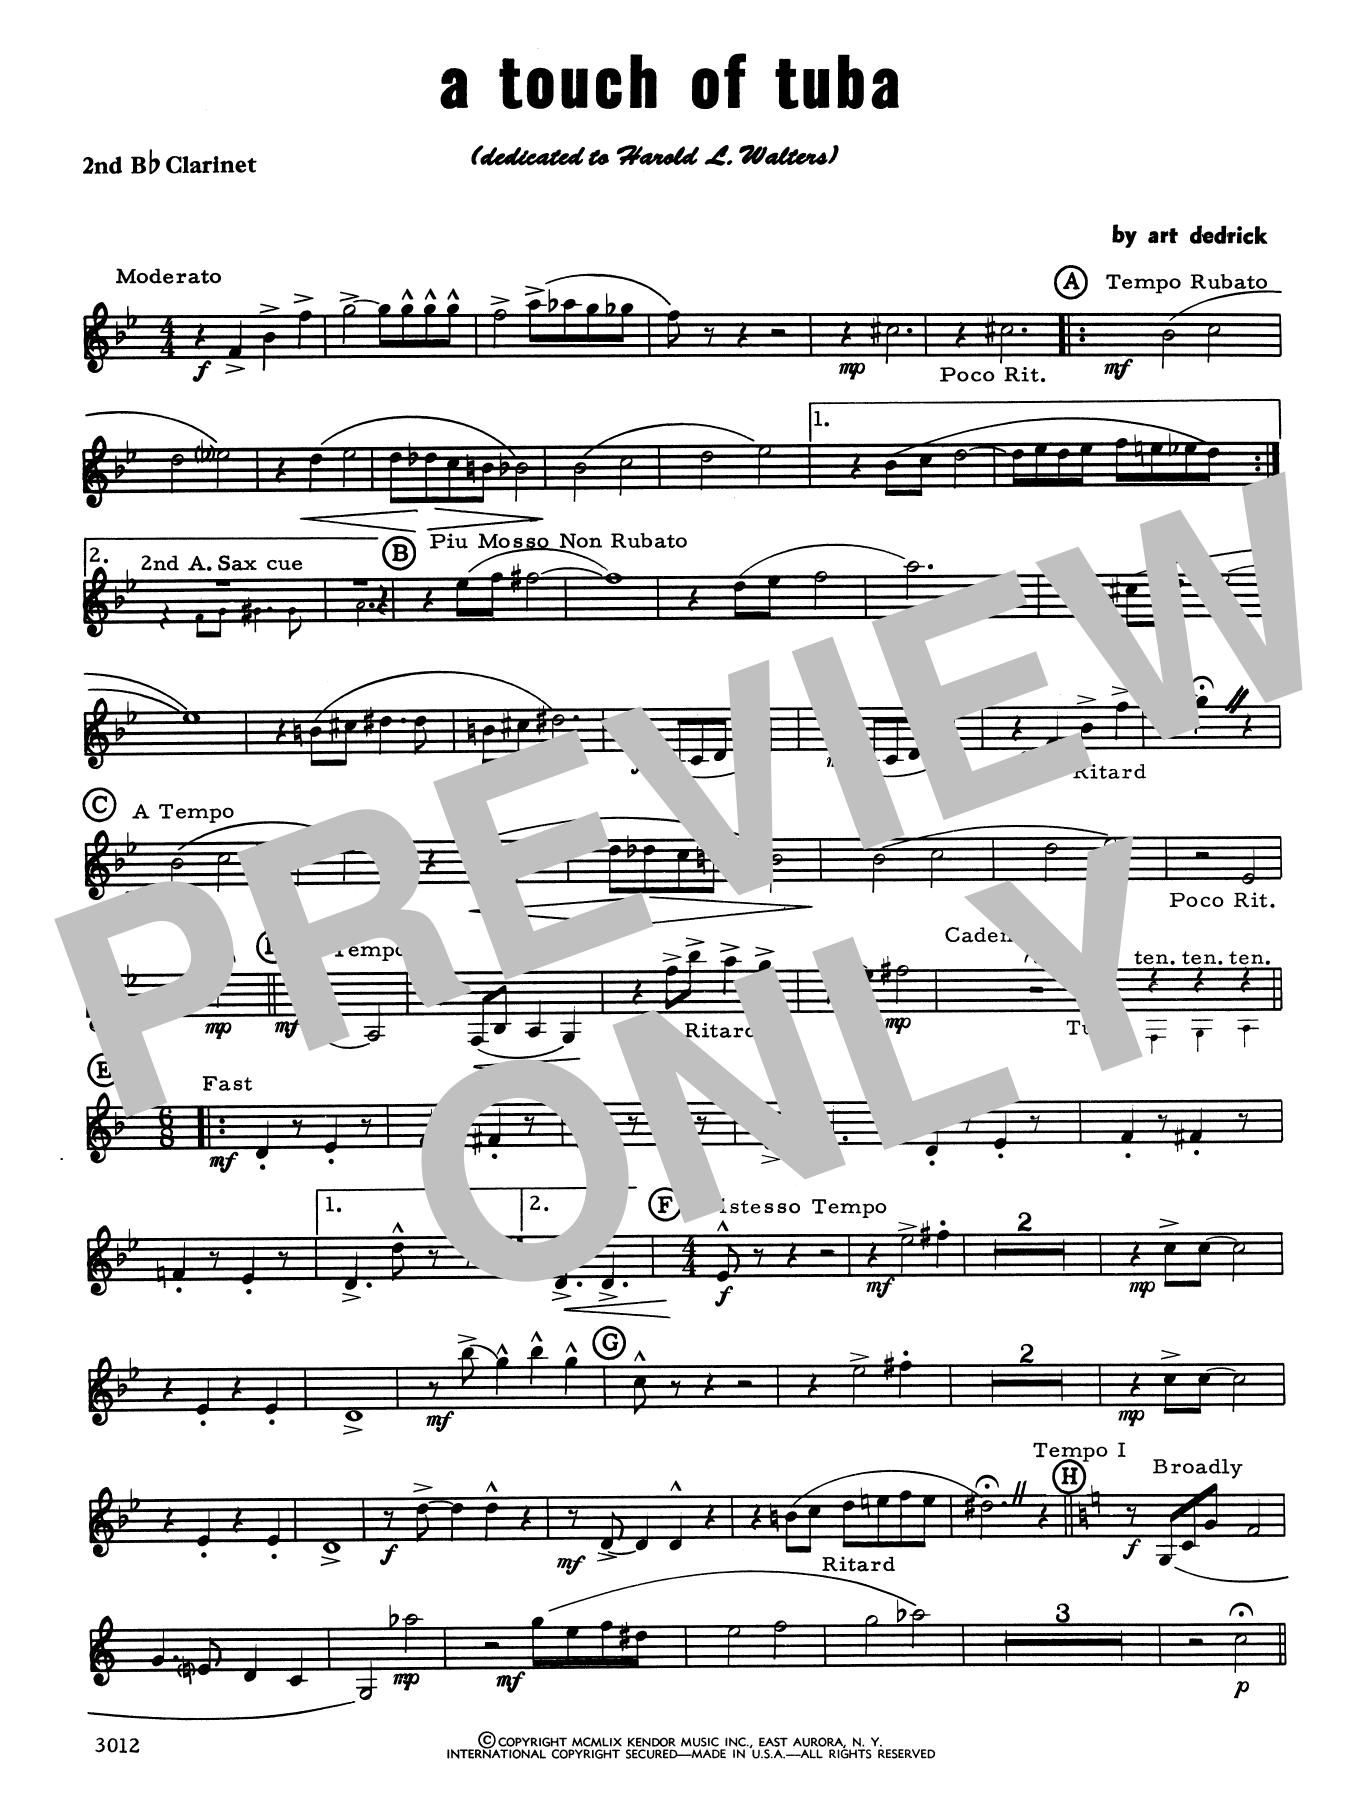 Art Dedrick A Touch Of Tuba - 2nd Bb Clarinet sheet music notes printable PDF score